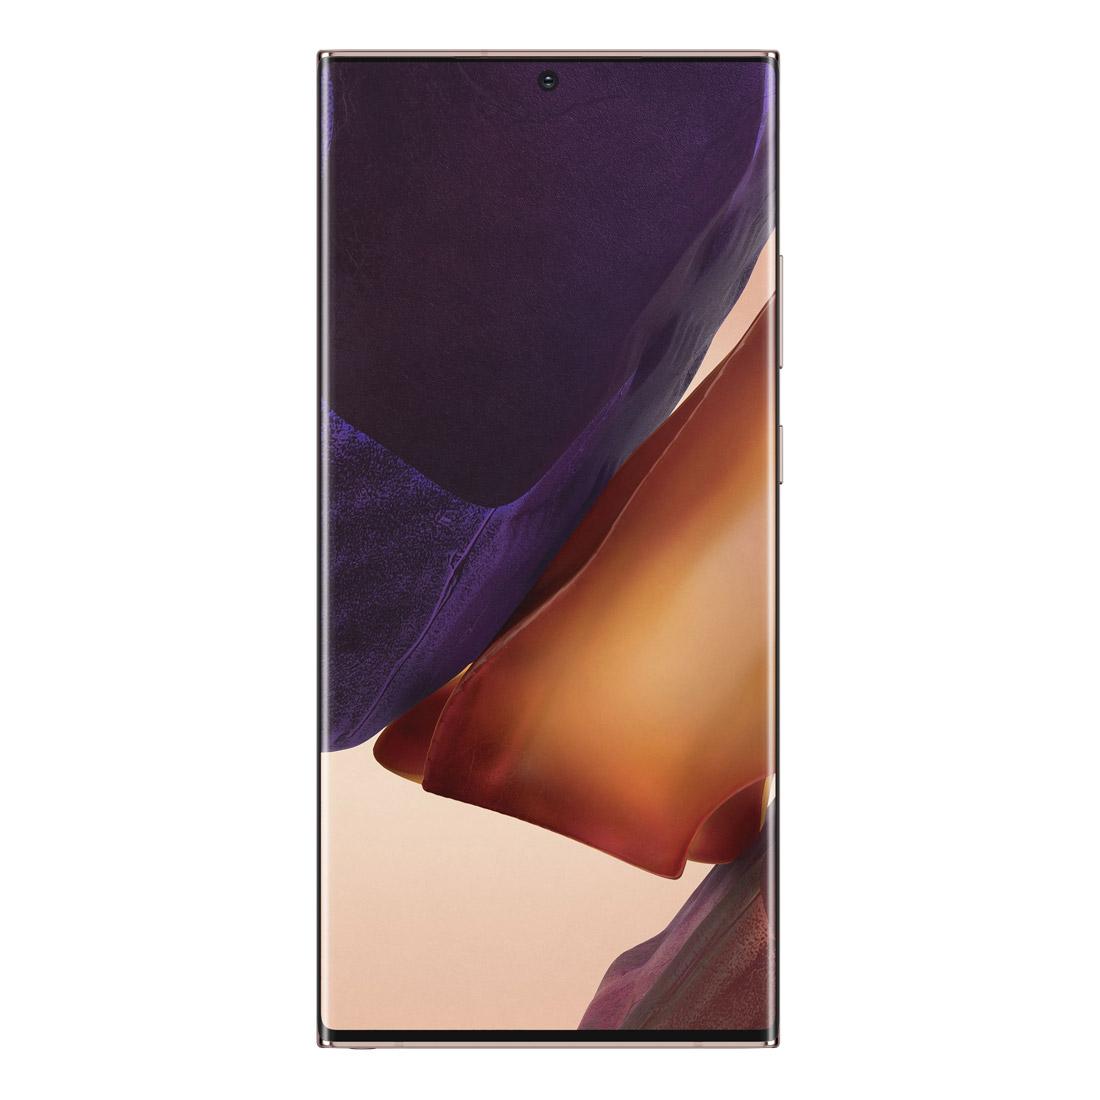 "Samsung Galaxy Note 20 Ultra 5G (6.9"" 120Hz, 108MP, 256GB/12GB) - Bronze"